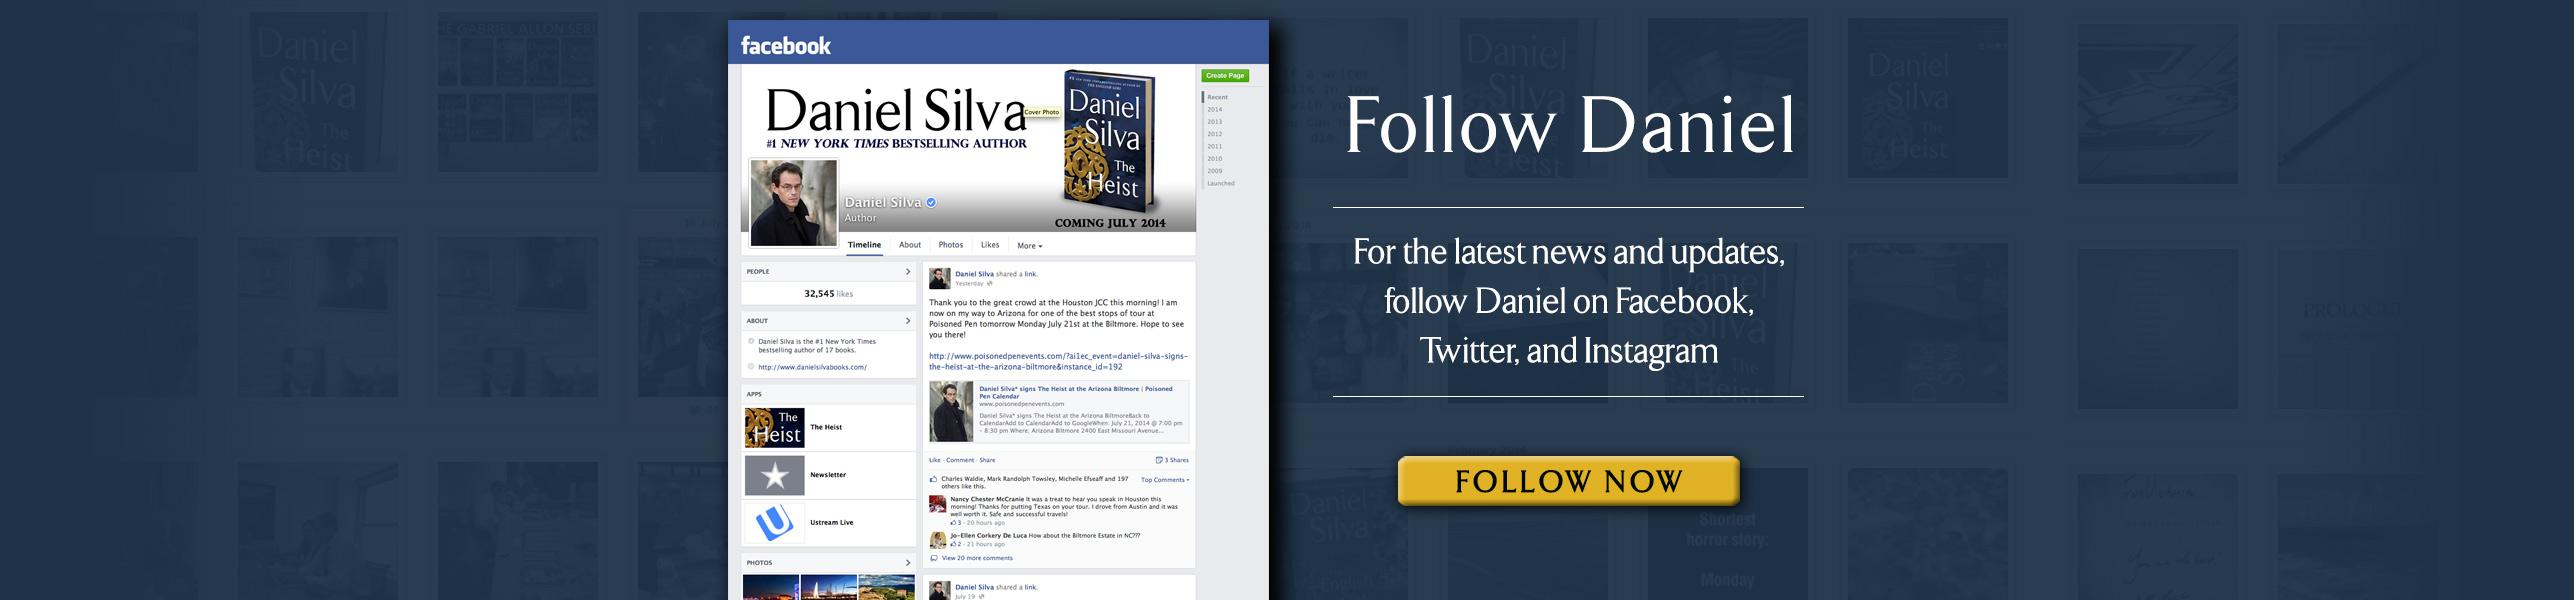 Follow Daniel on Social Media